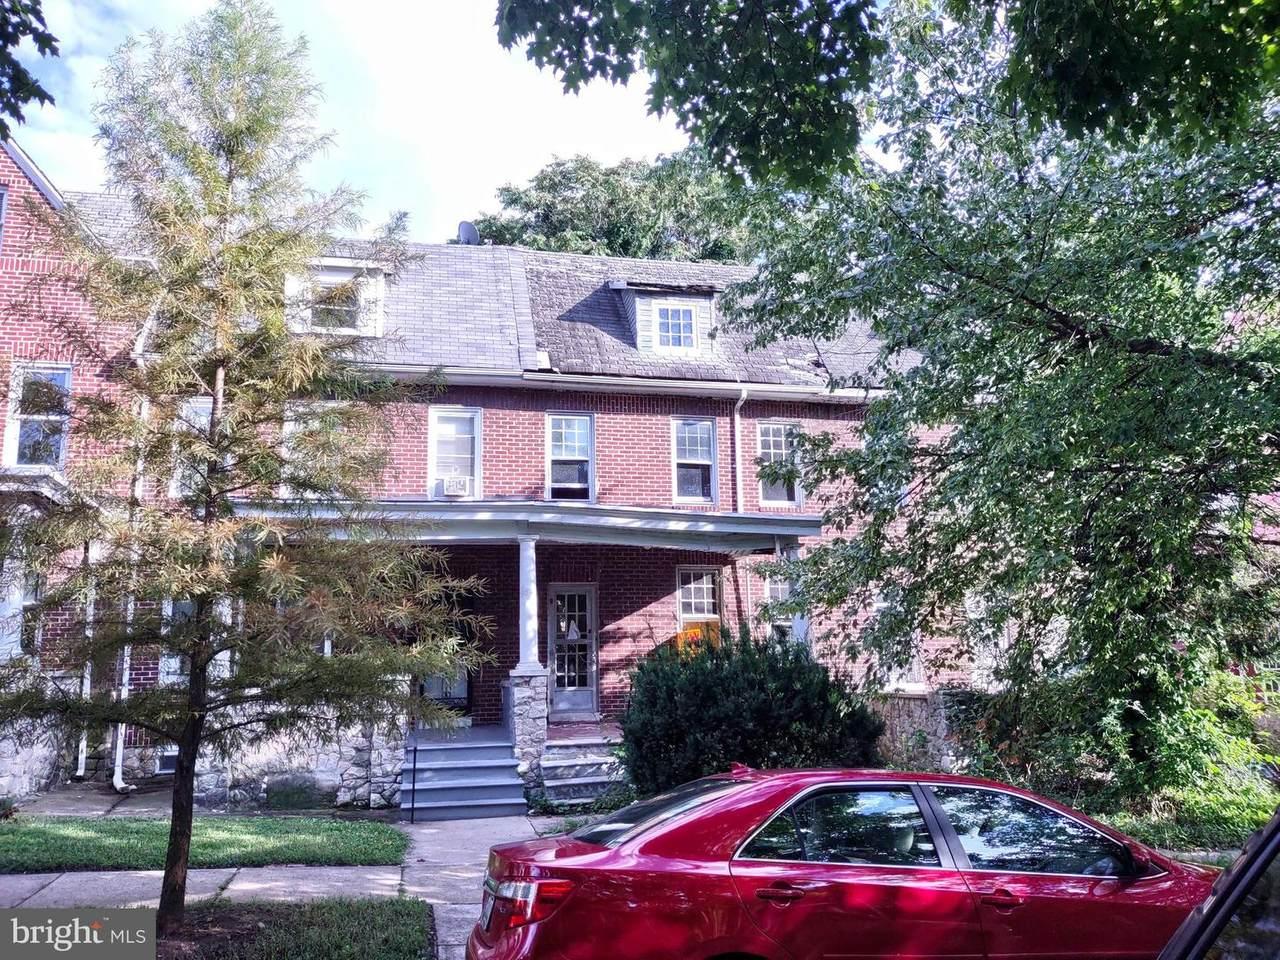 2215 Whittier Avenue - Photo 1